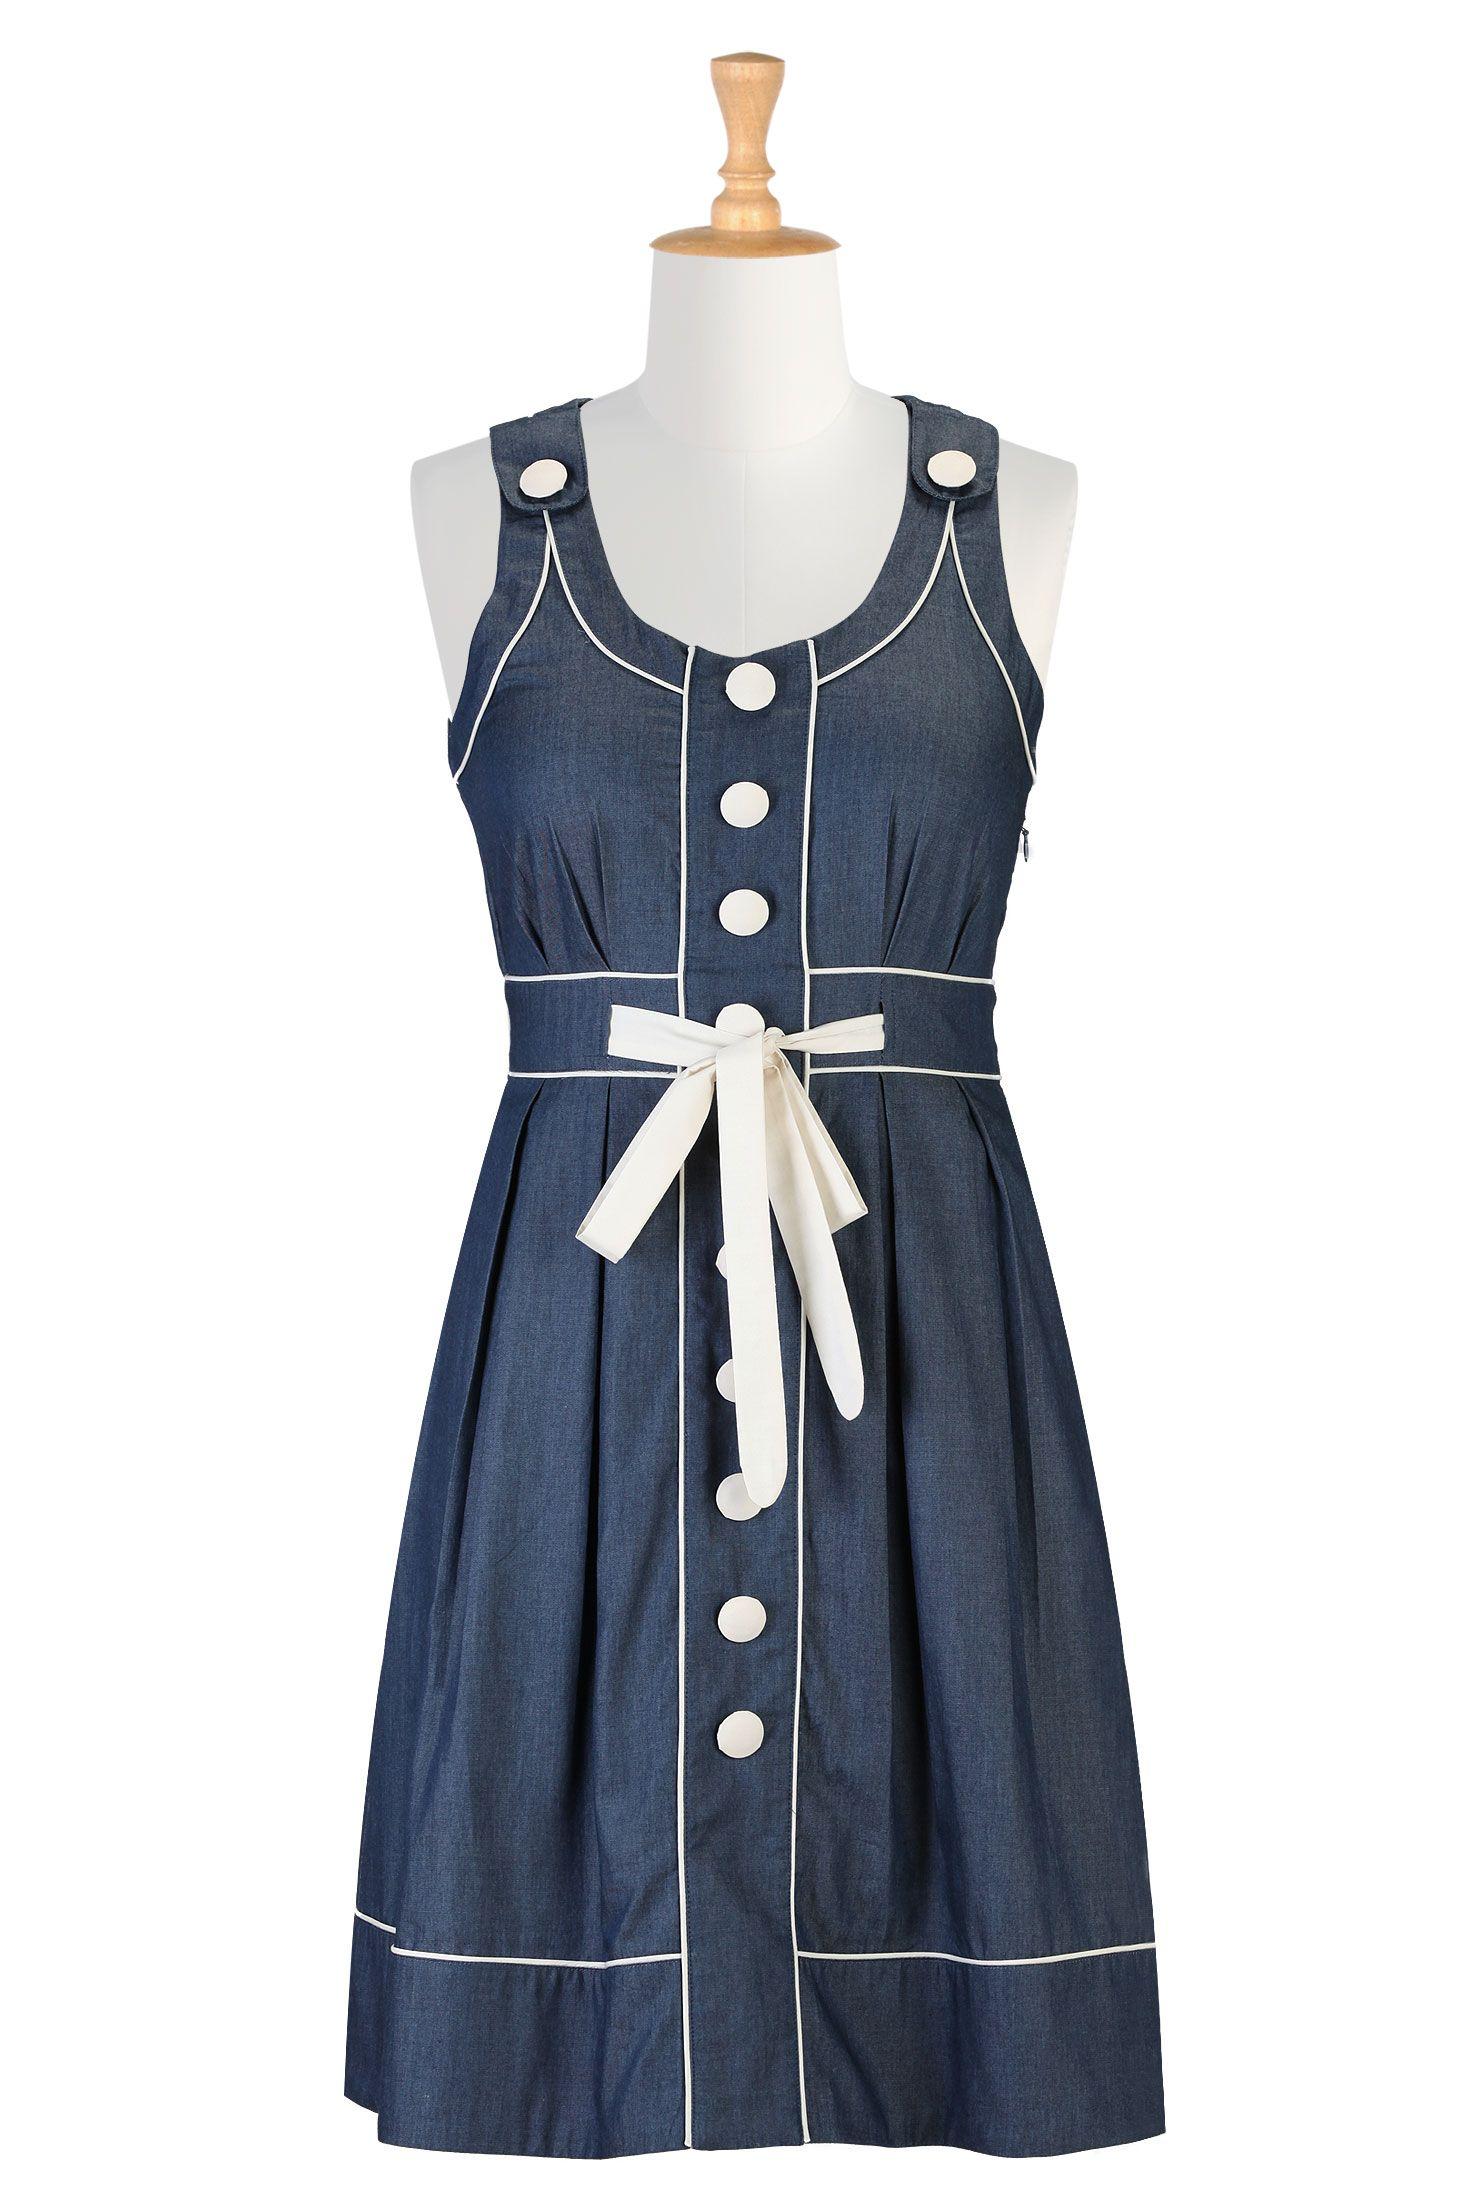 ca40e07a6a Shop women s fashion dresses